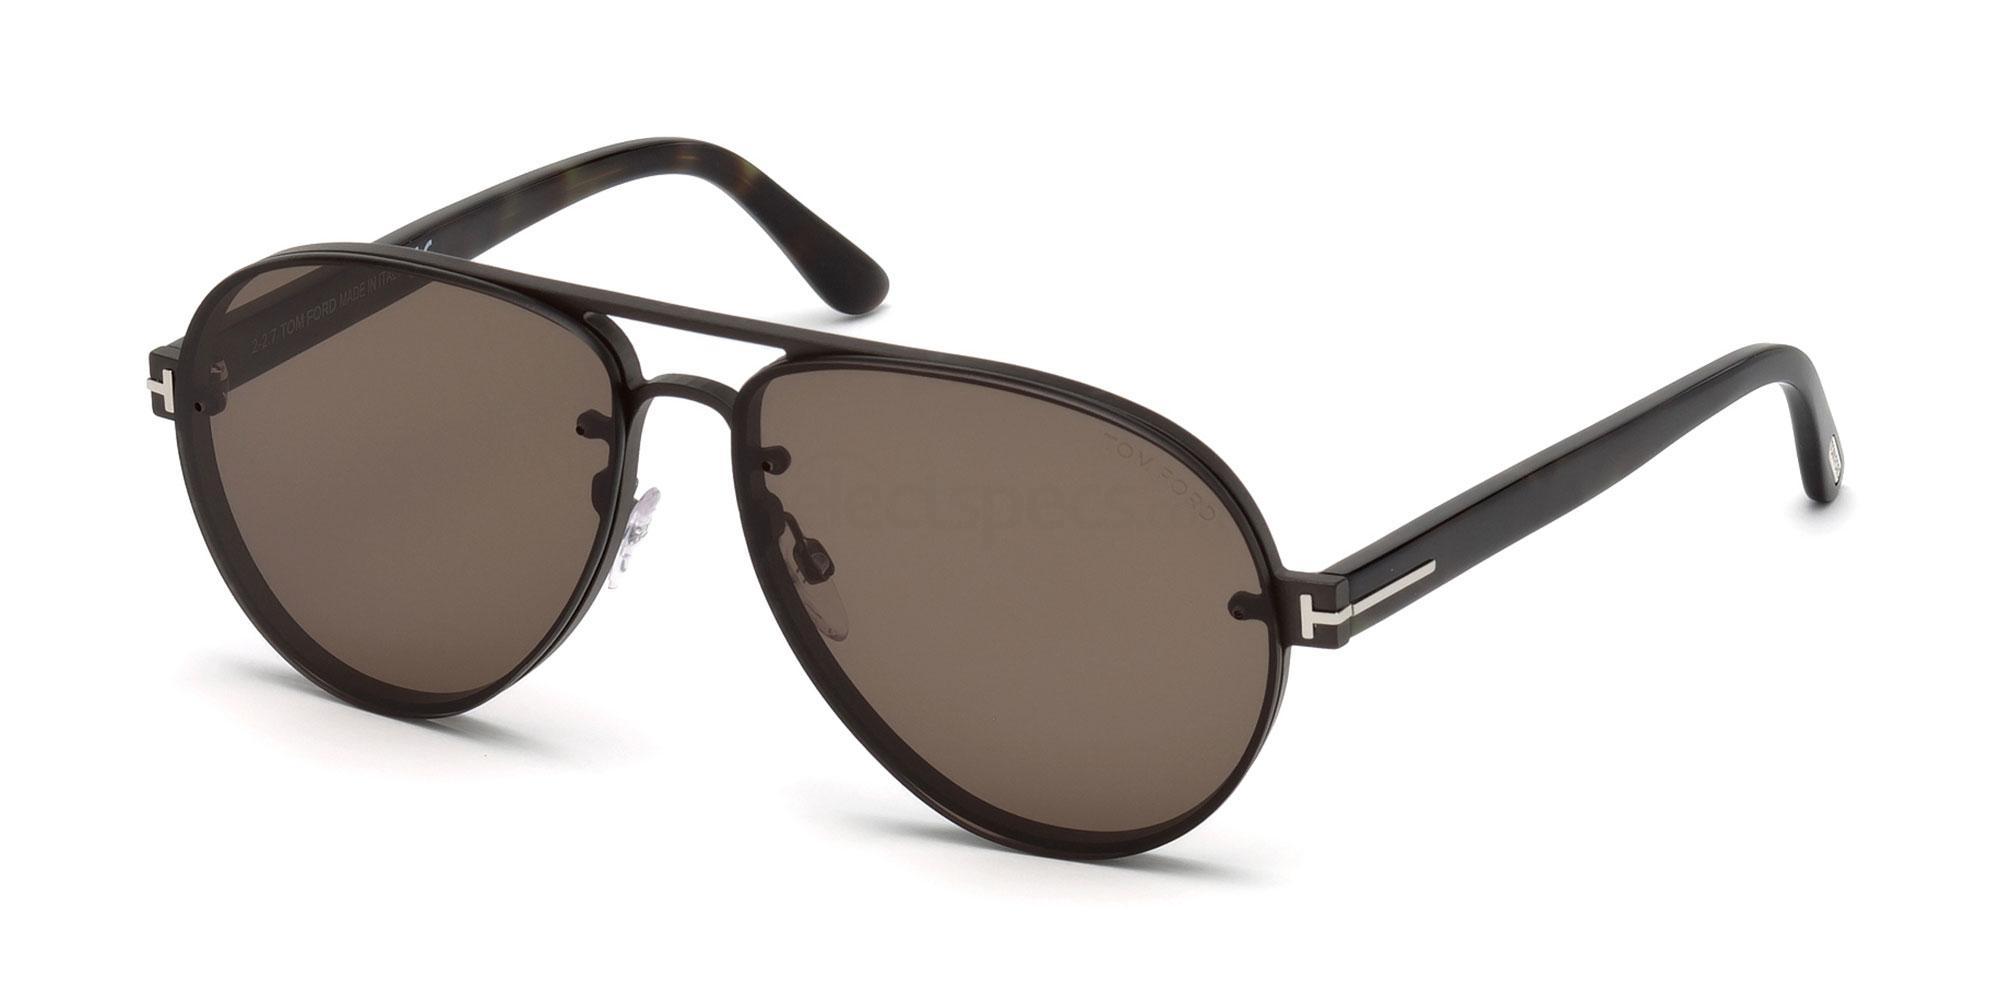 12J FT0622 Sunglasses, Tom Ford